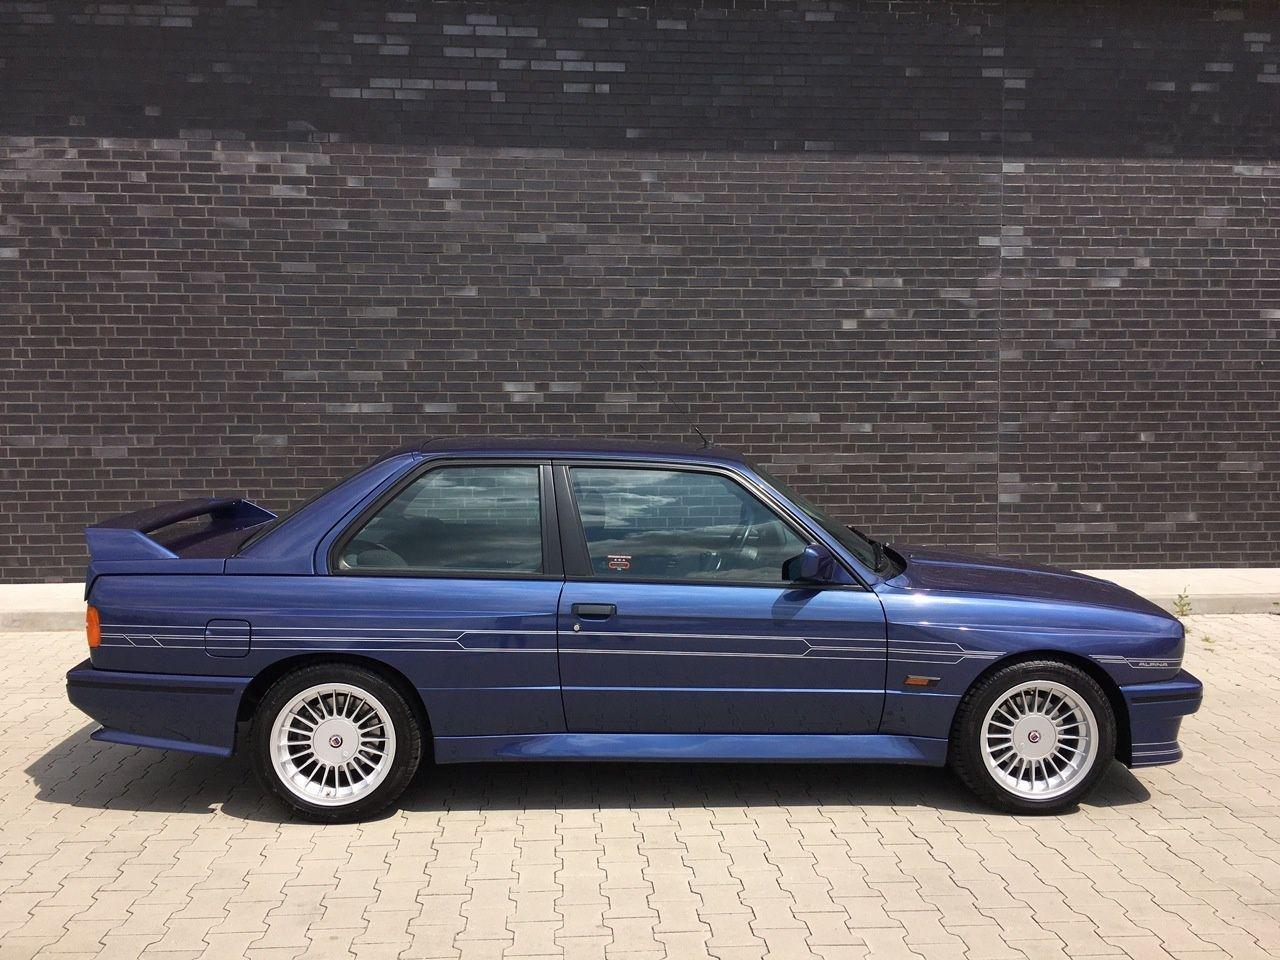 1989 Alpina B6 Sold B6 3 5s Classic Driver Market